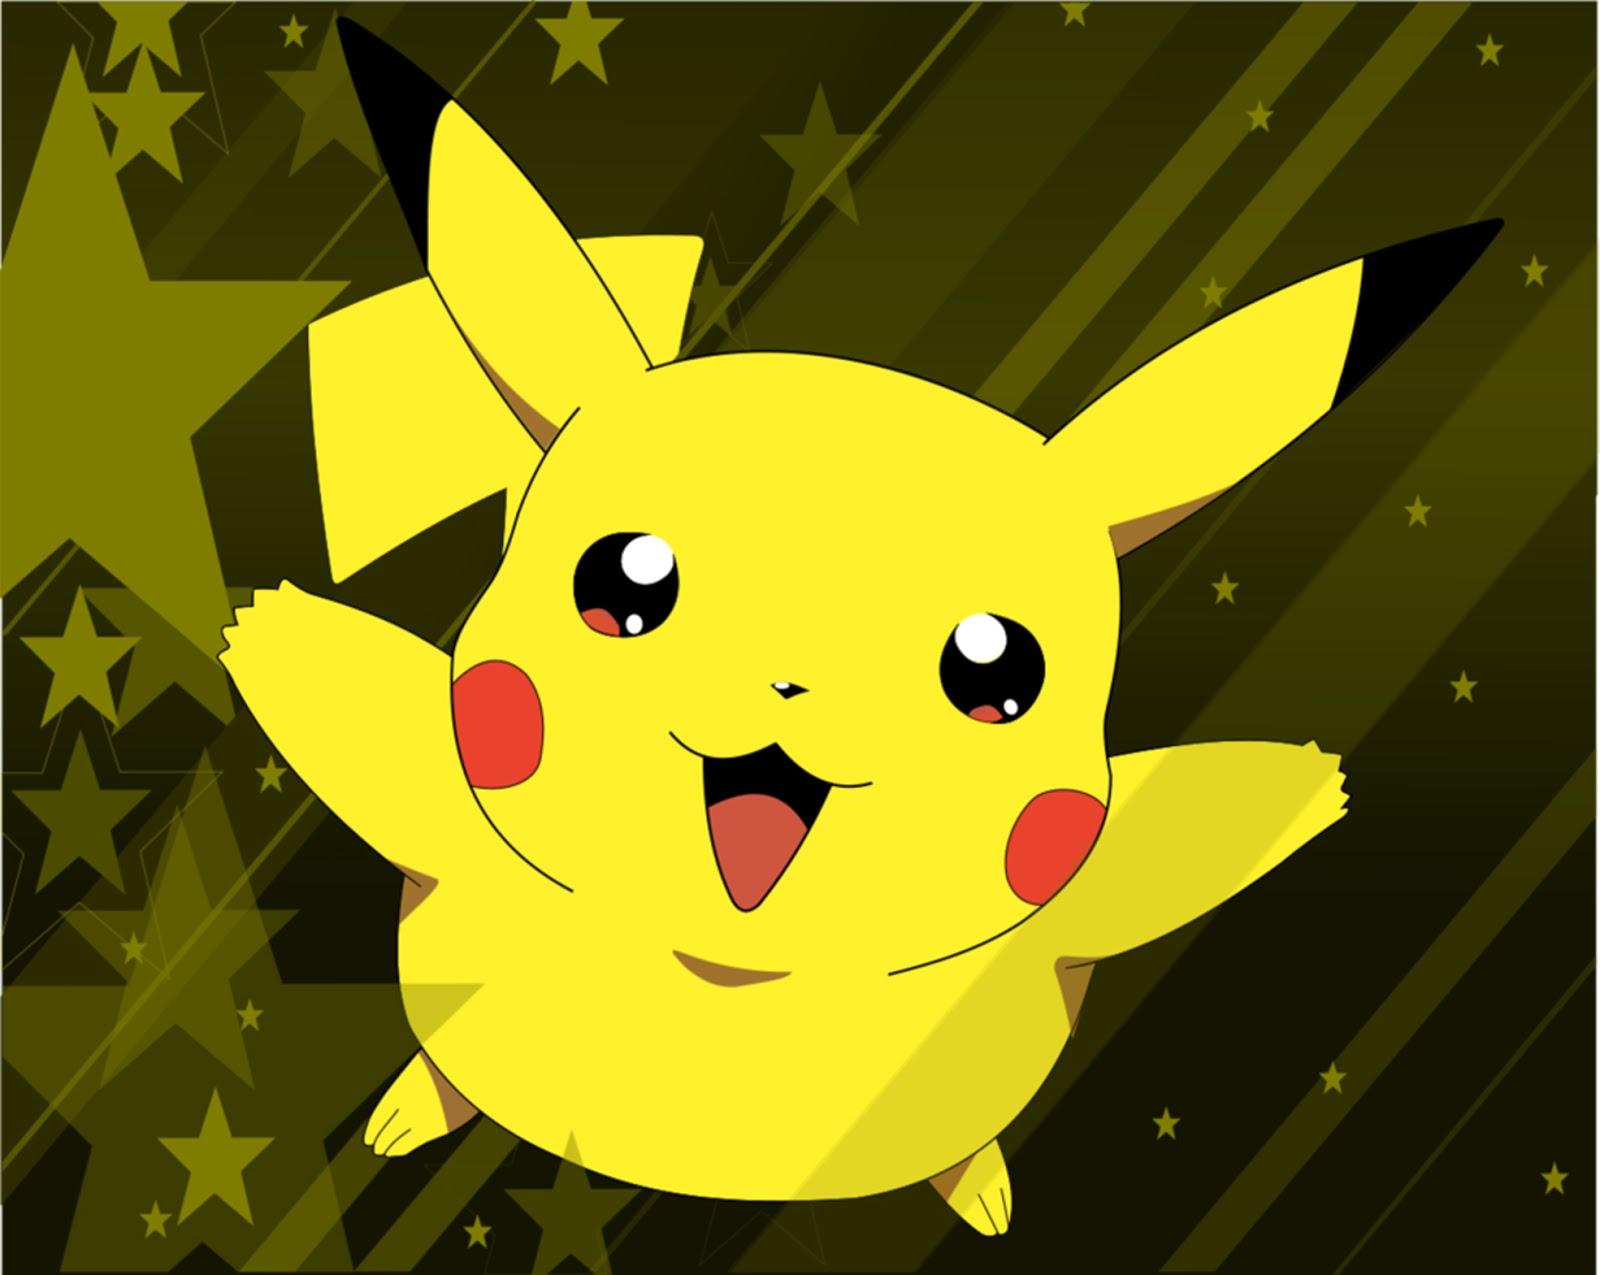 Pikachu Wallpaper | Perfect Wallpaper